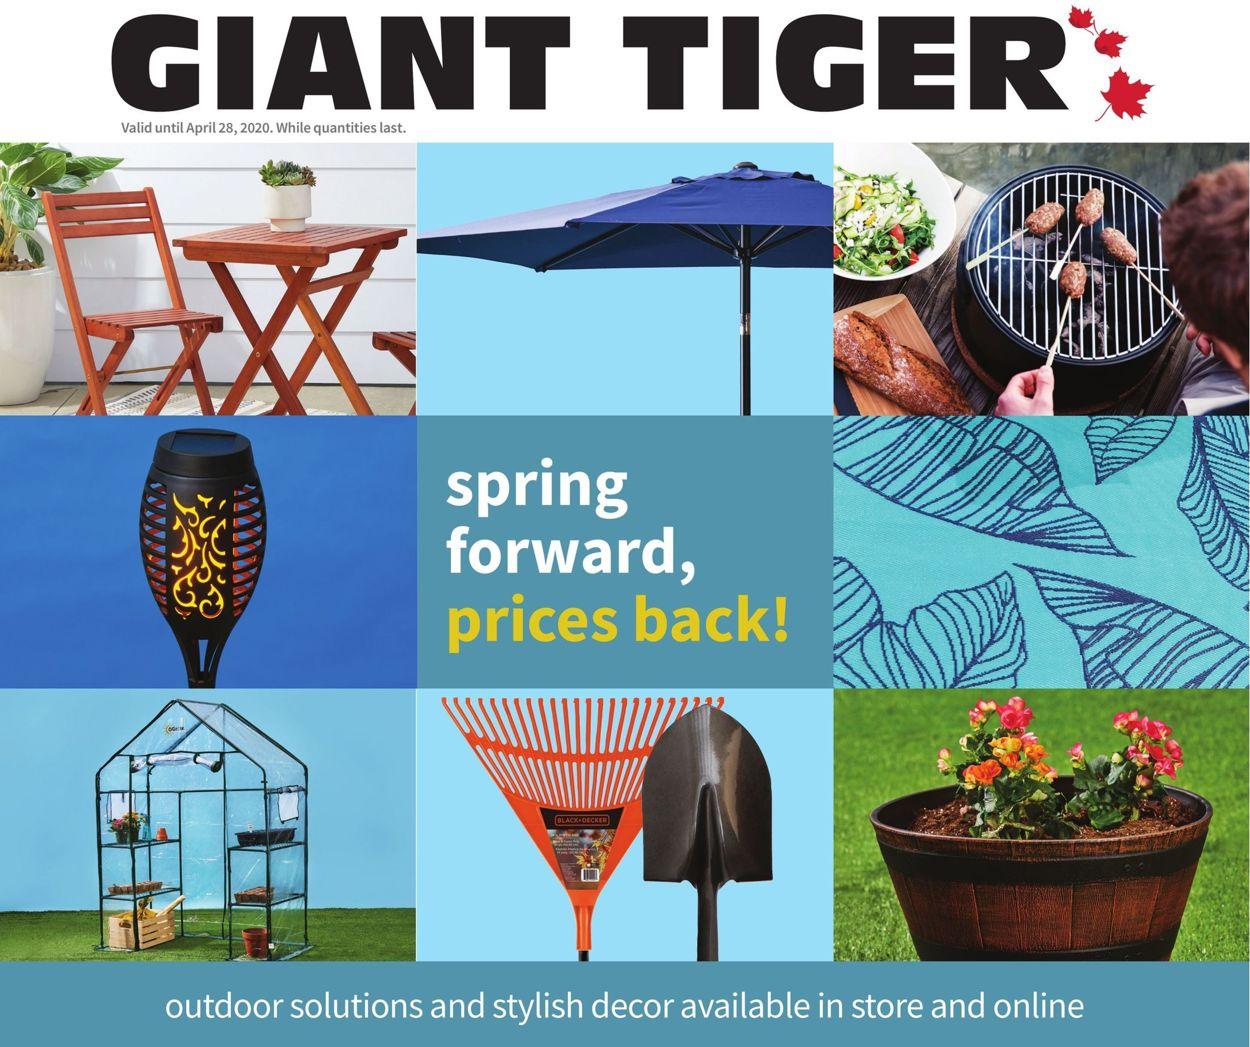 Giant Tiger Flyer - 03/26-04/28/2020